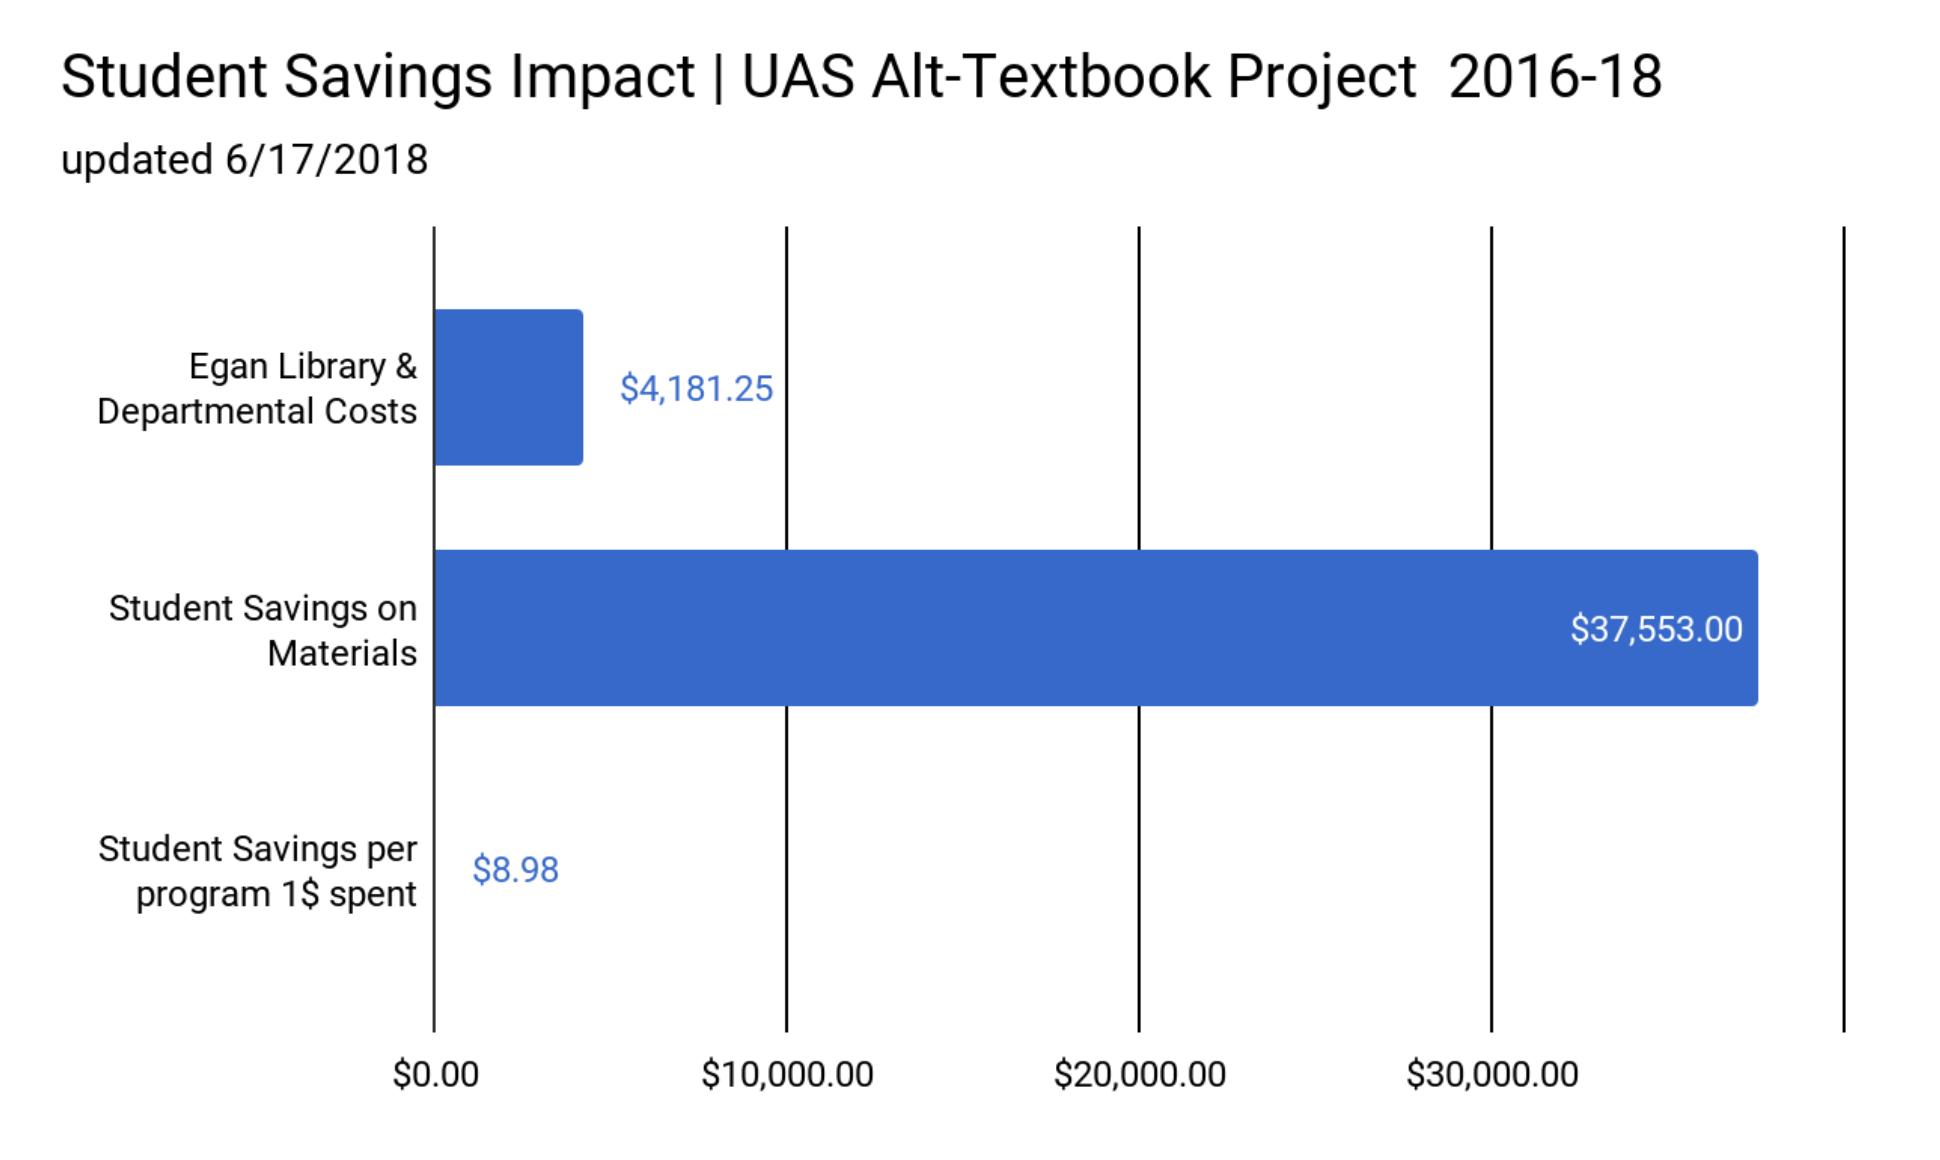 Student Savings Impact